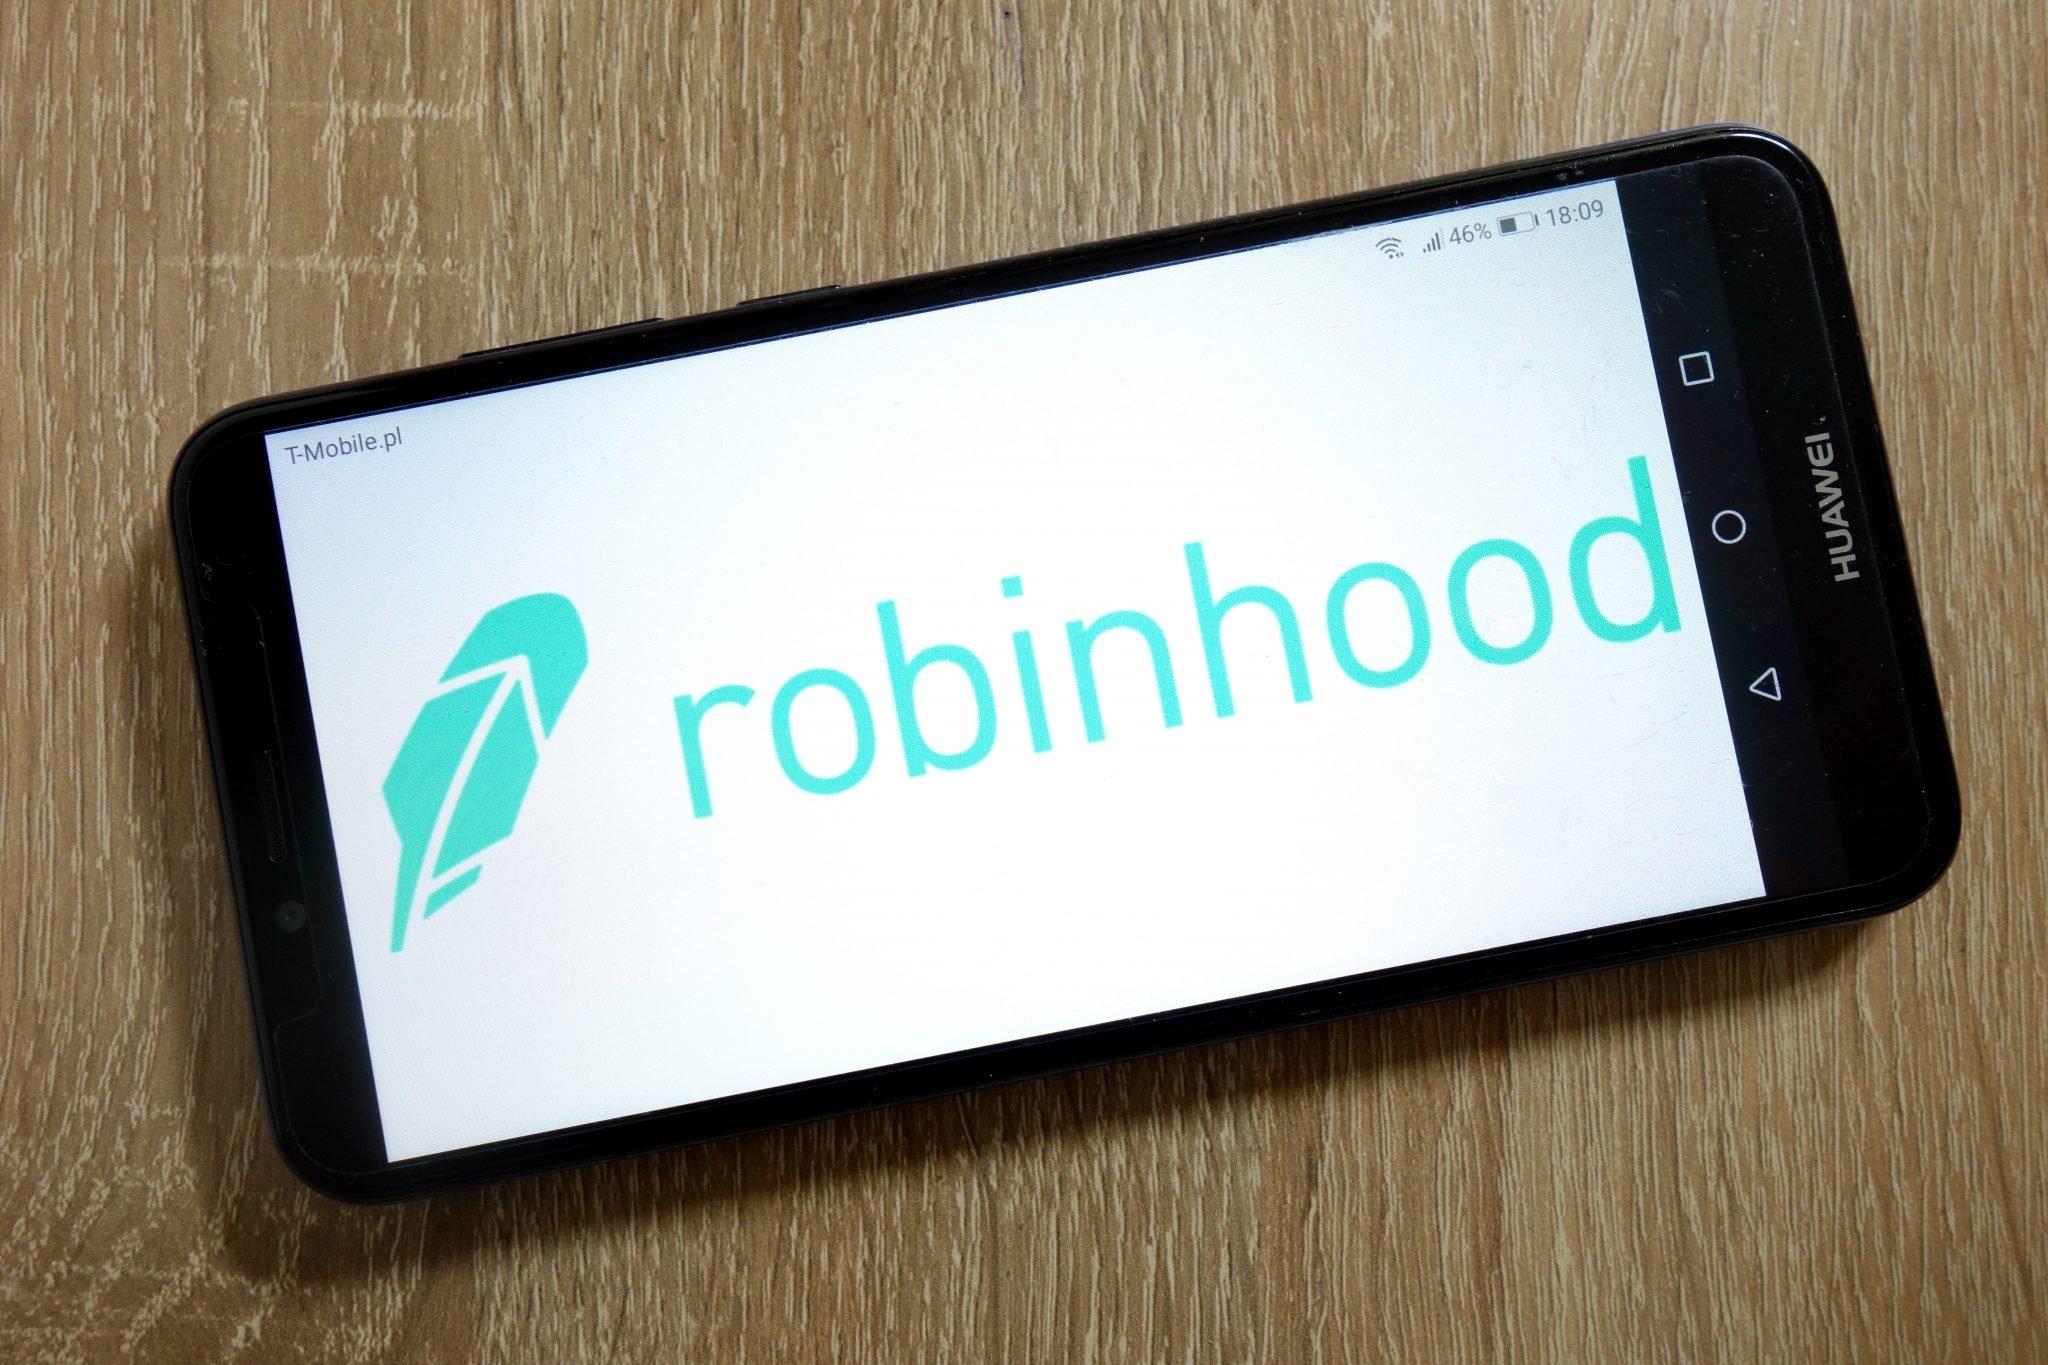 KONSKIE, POLAND - January 10, 2019: Robinhood company logo displayed on smartphone